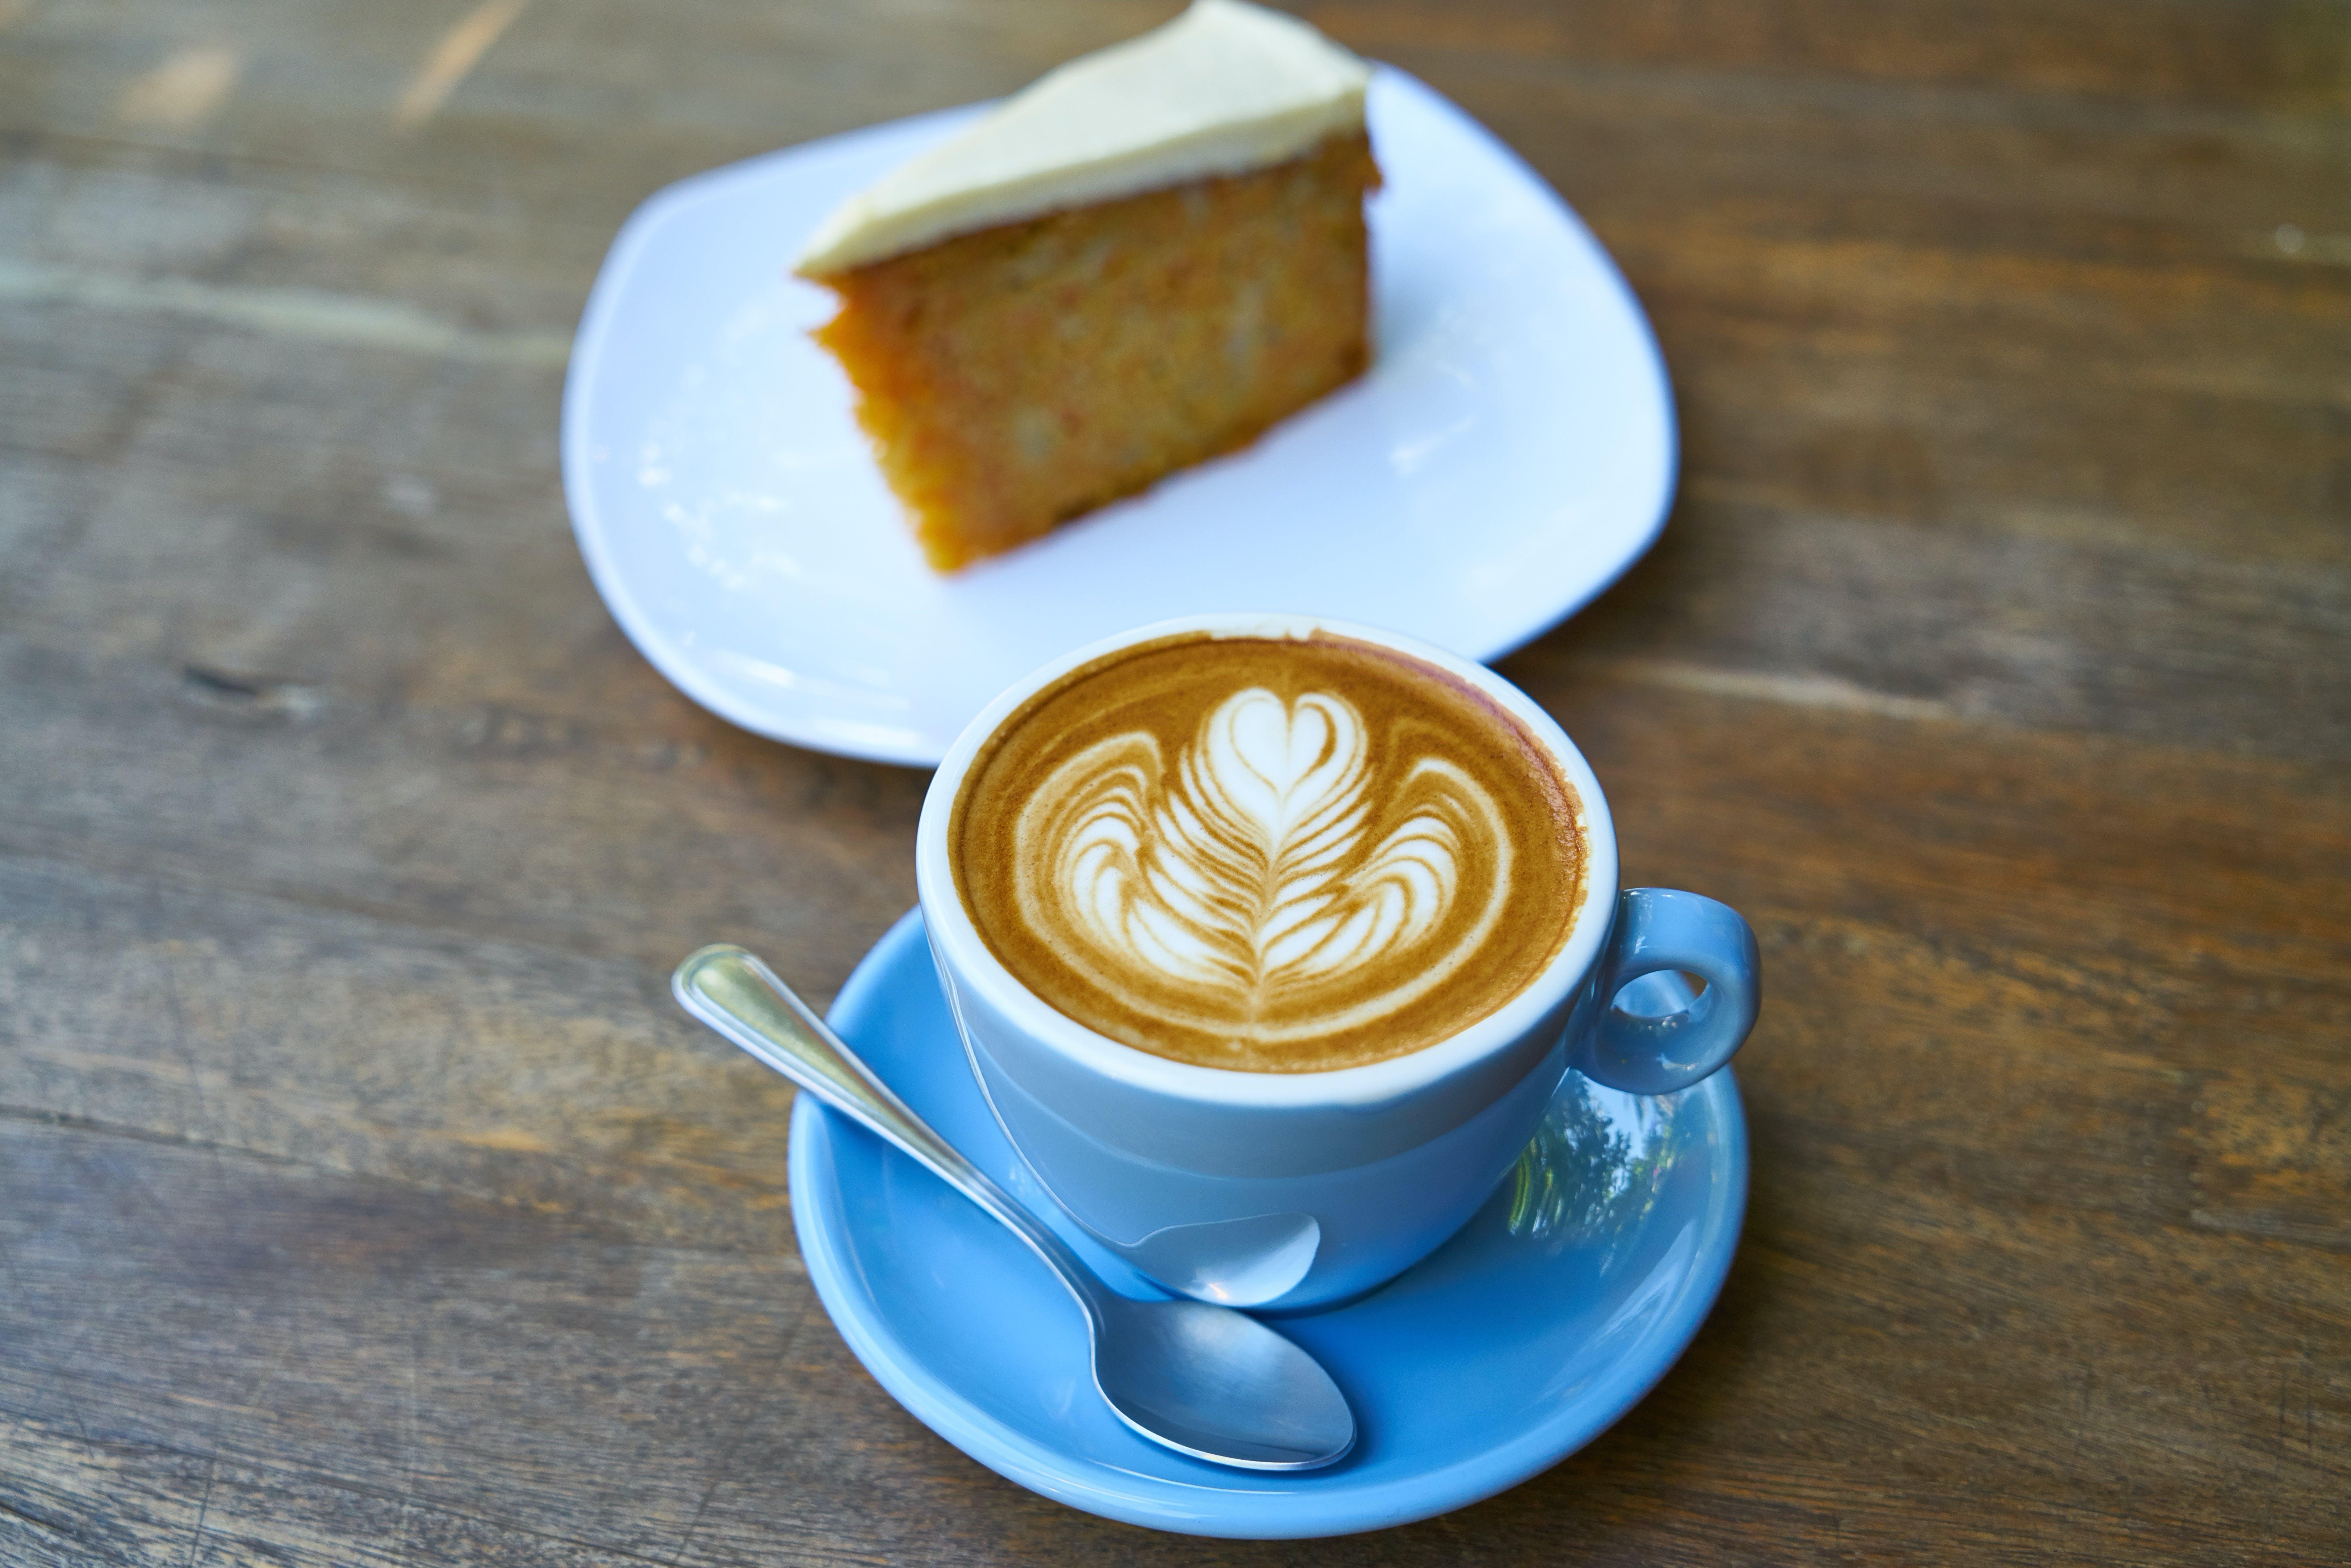 Free stock photo of food, wood, dawn, caffeine